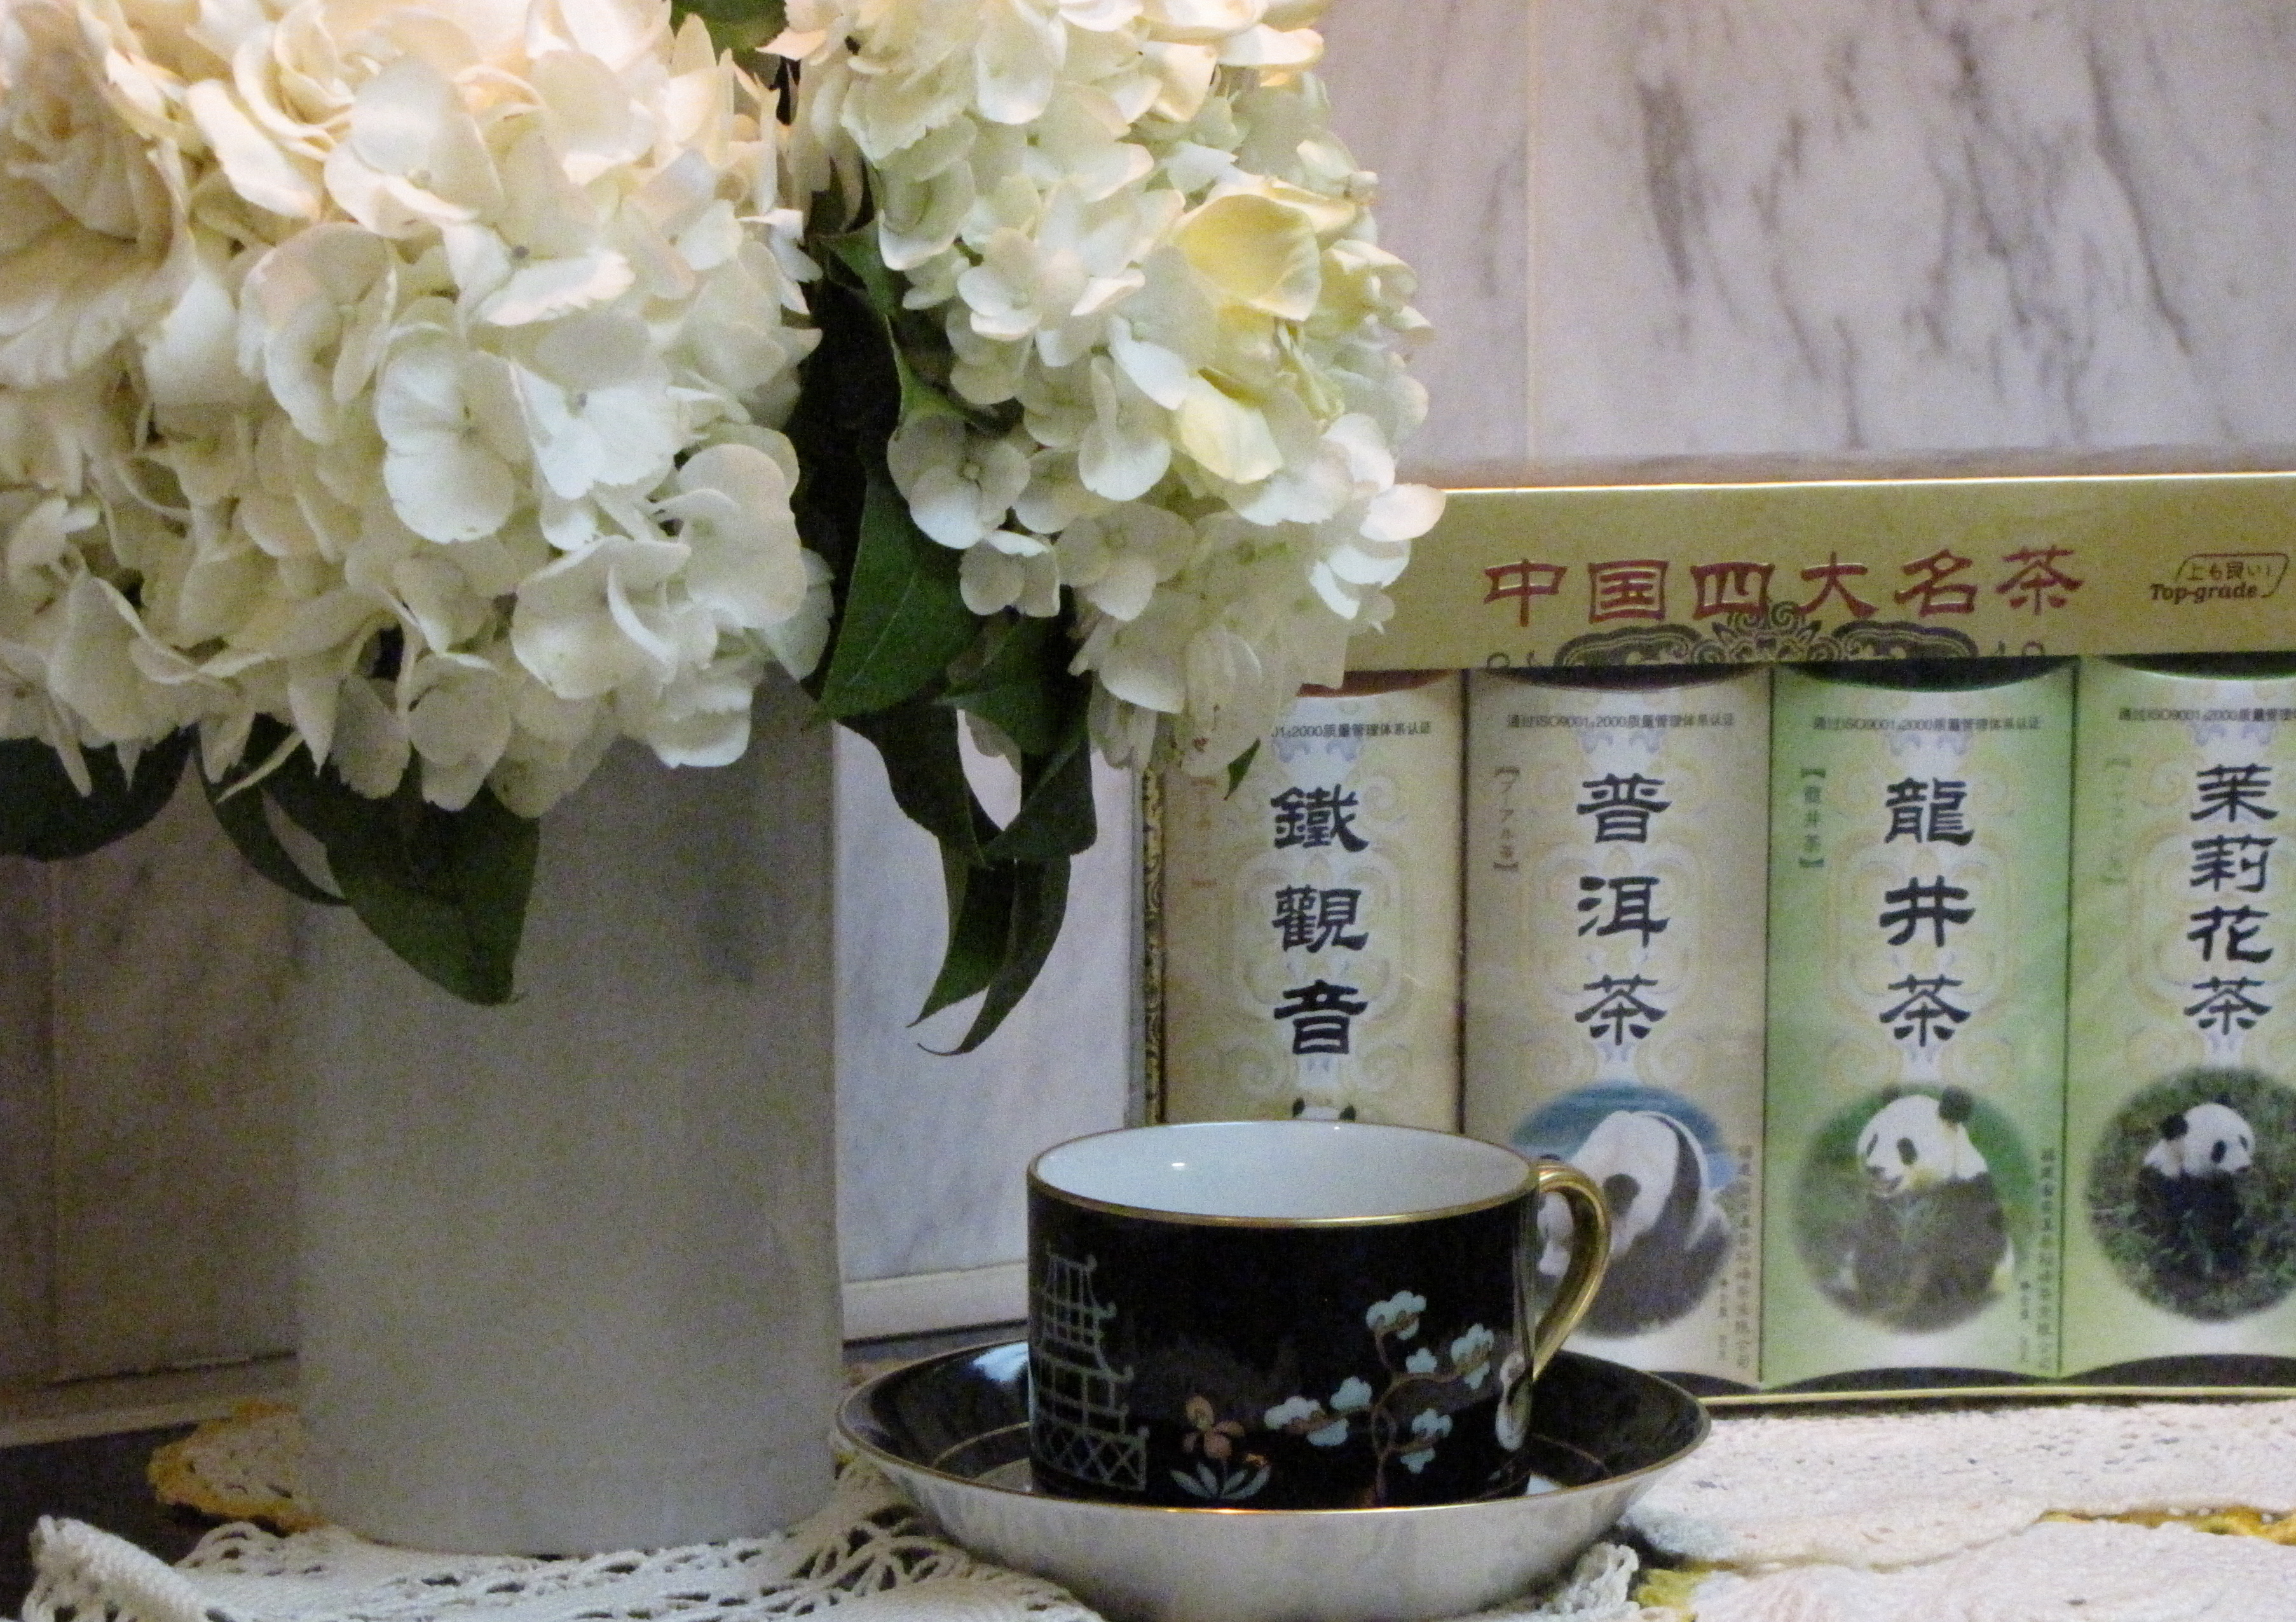 Fitz andFloyd Tea Cup